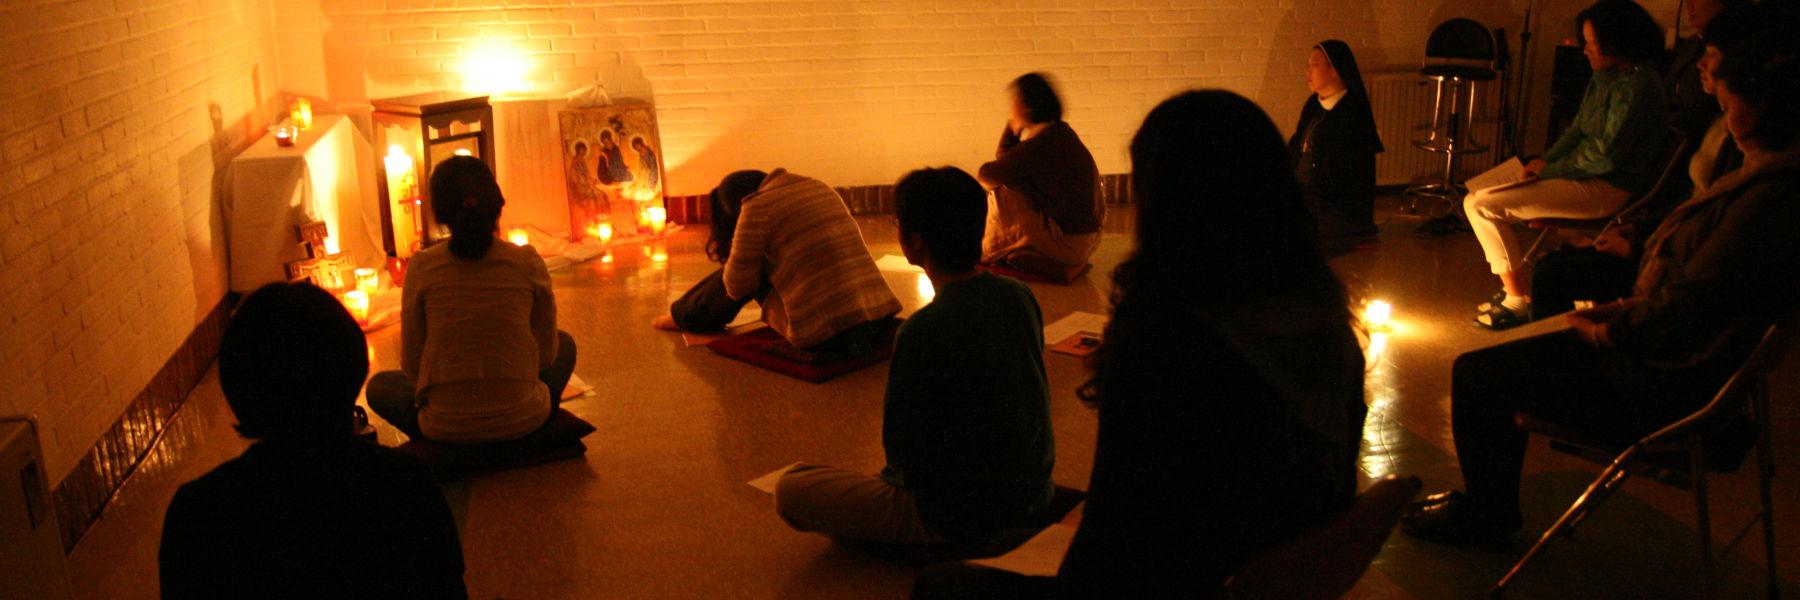 SHC Taize prayer